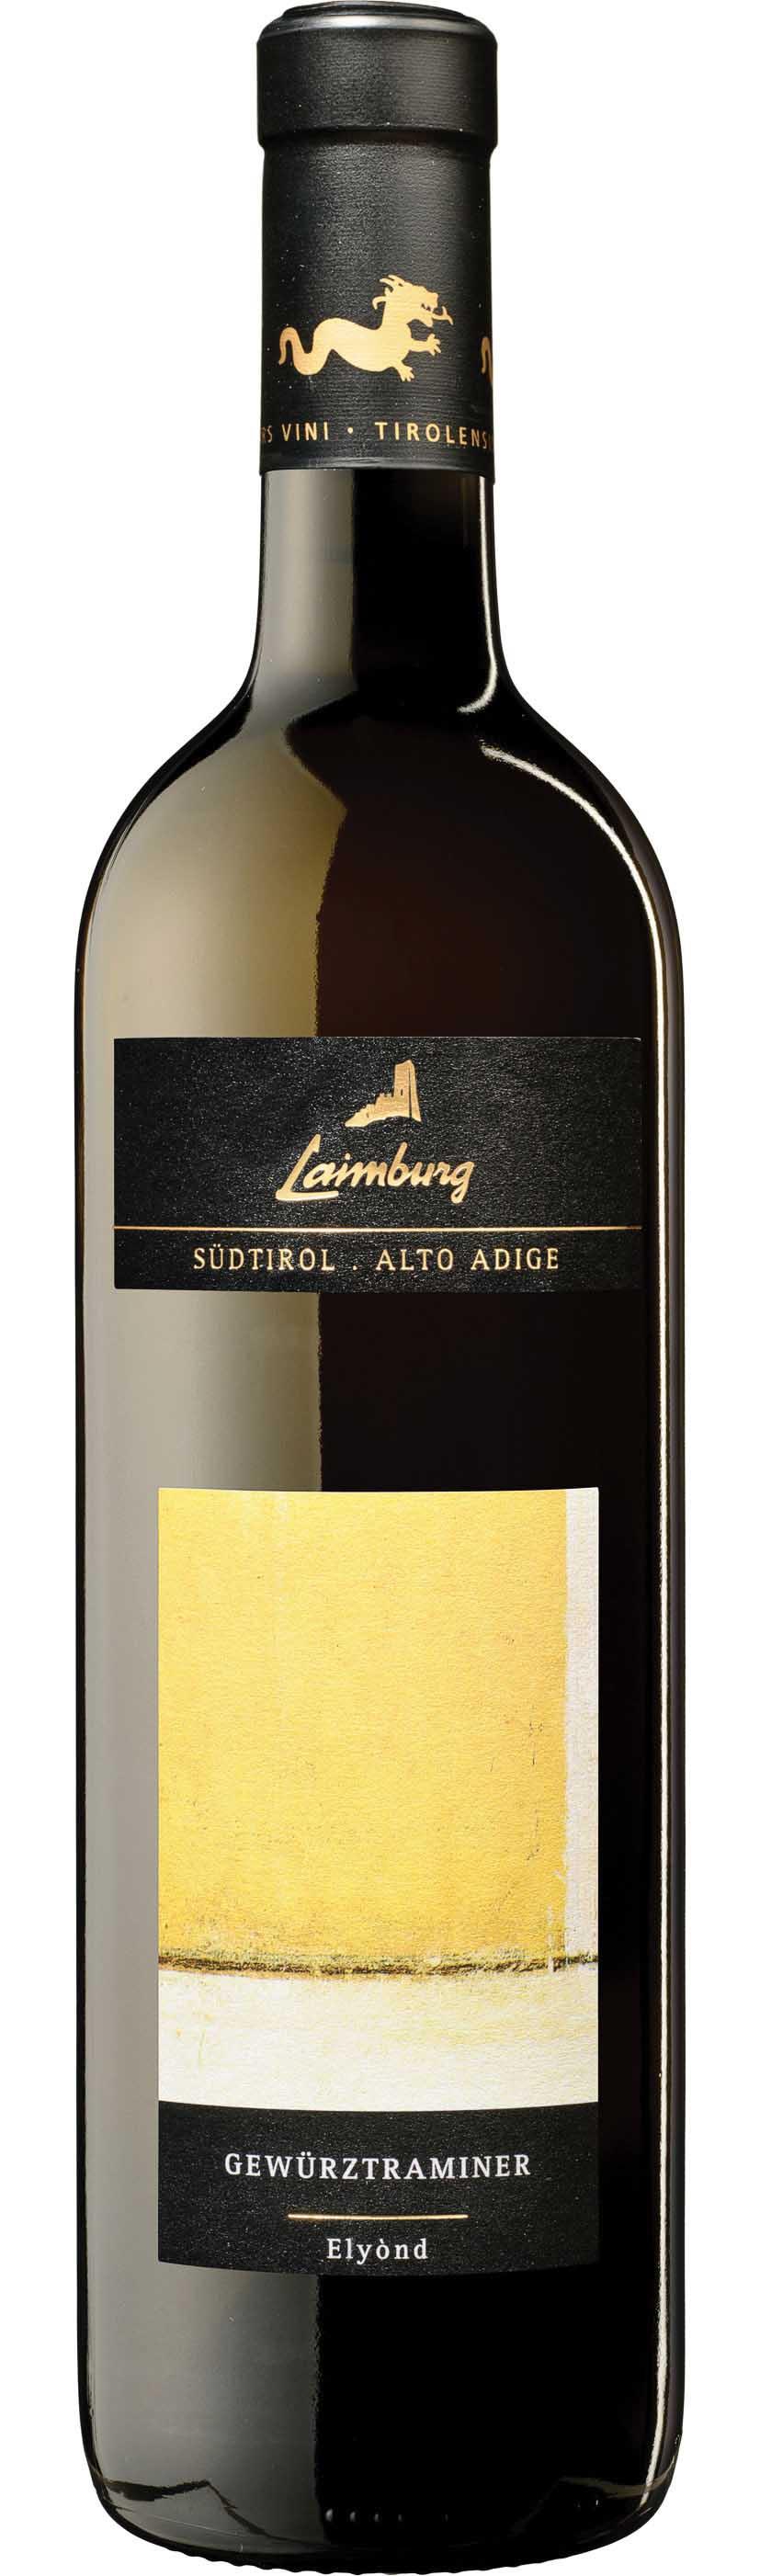 laimburg gewuerztraminer elyond annata 2010 premiato vinitaly